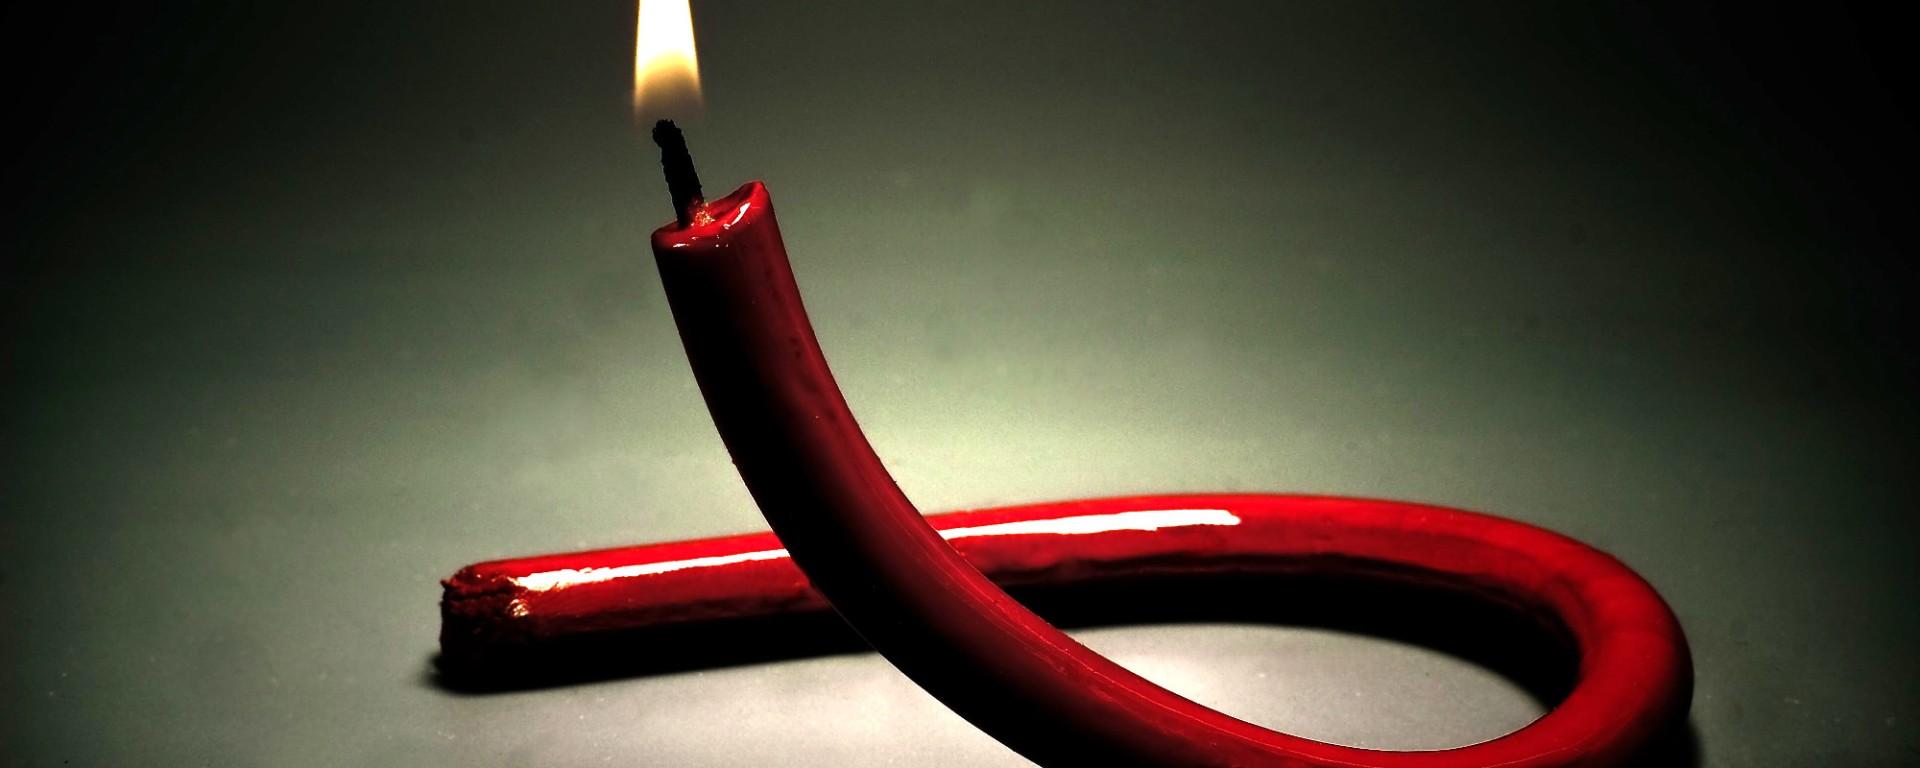 HIV Ribbon. Image Sergey Mikheev via Unsplash